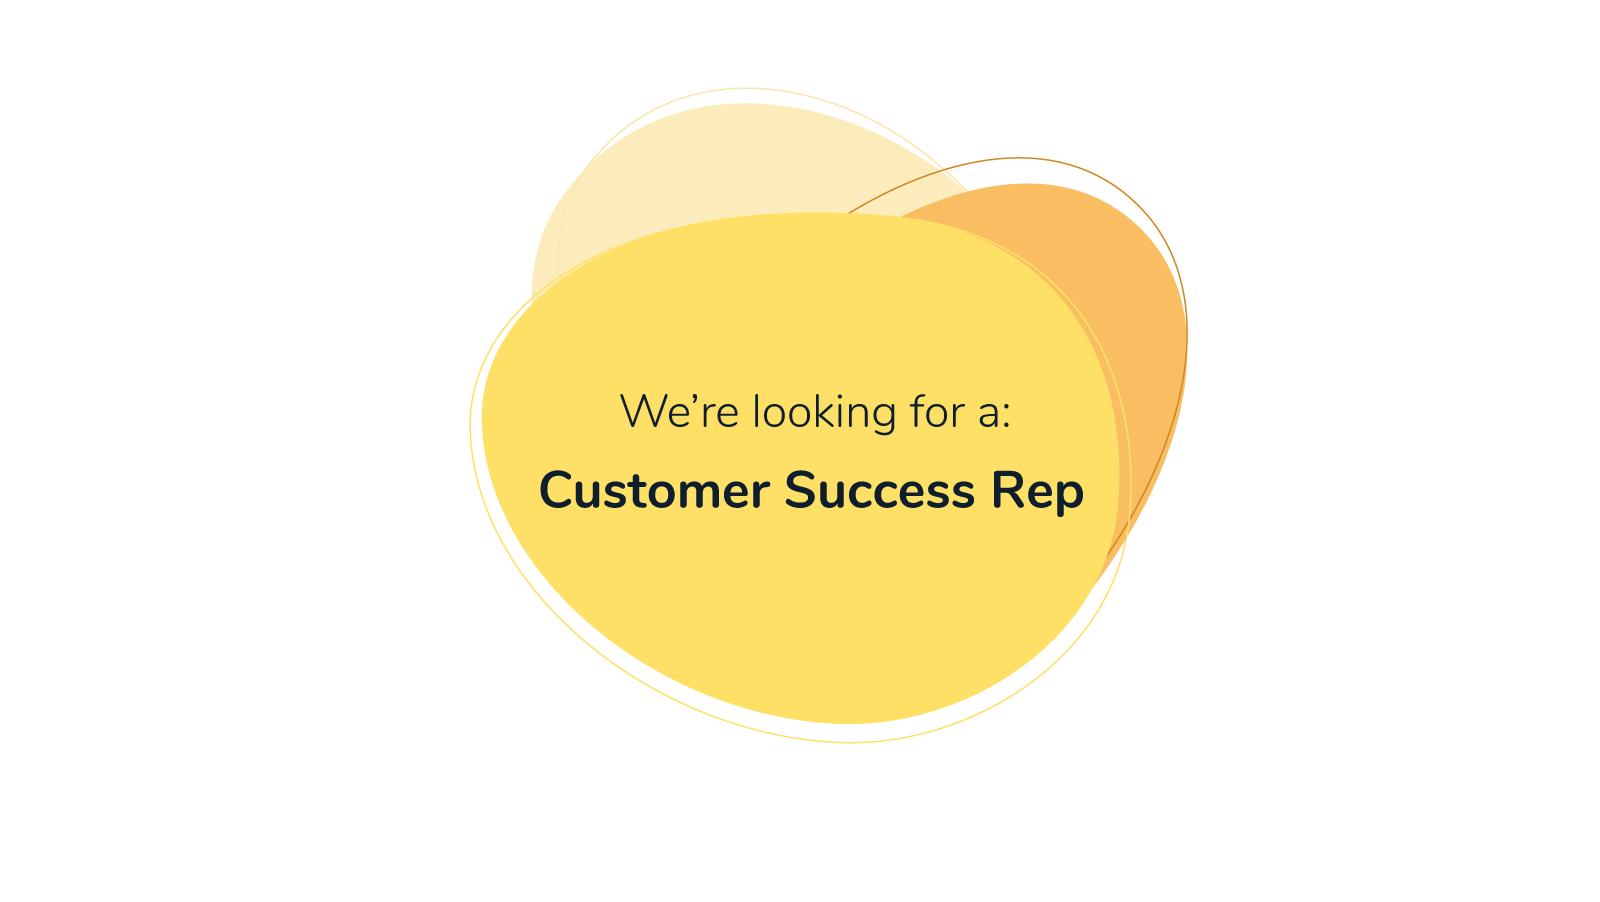 Customer Success Rep at Slidebean